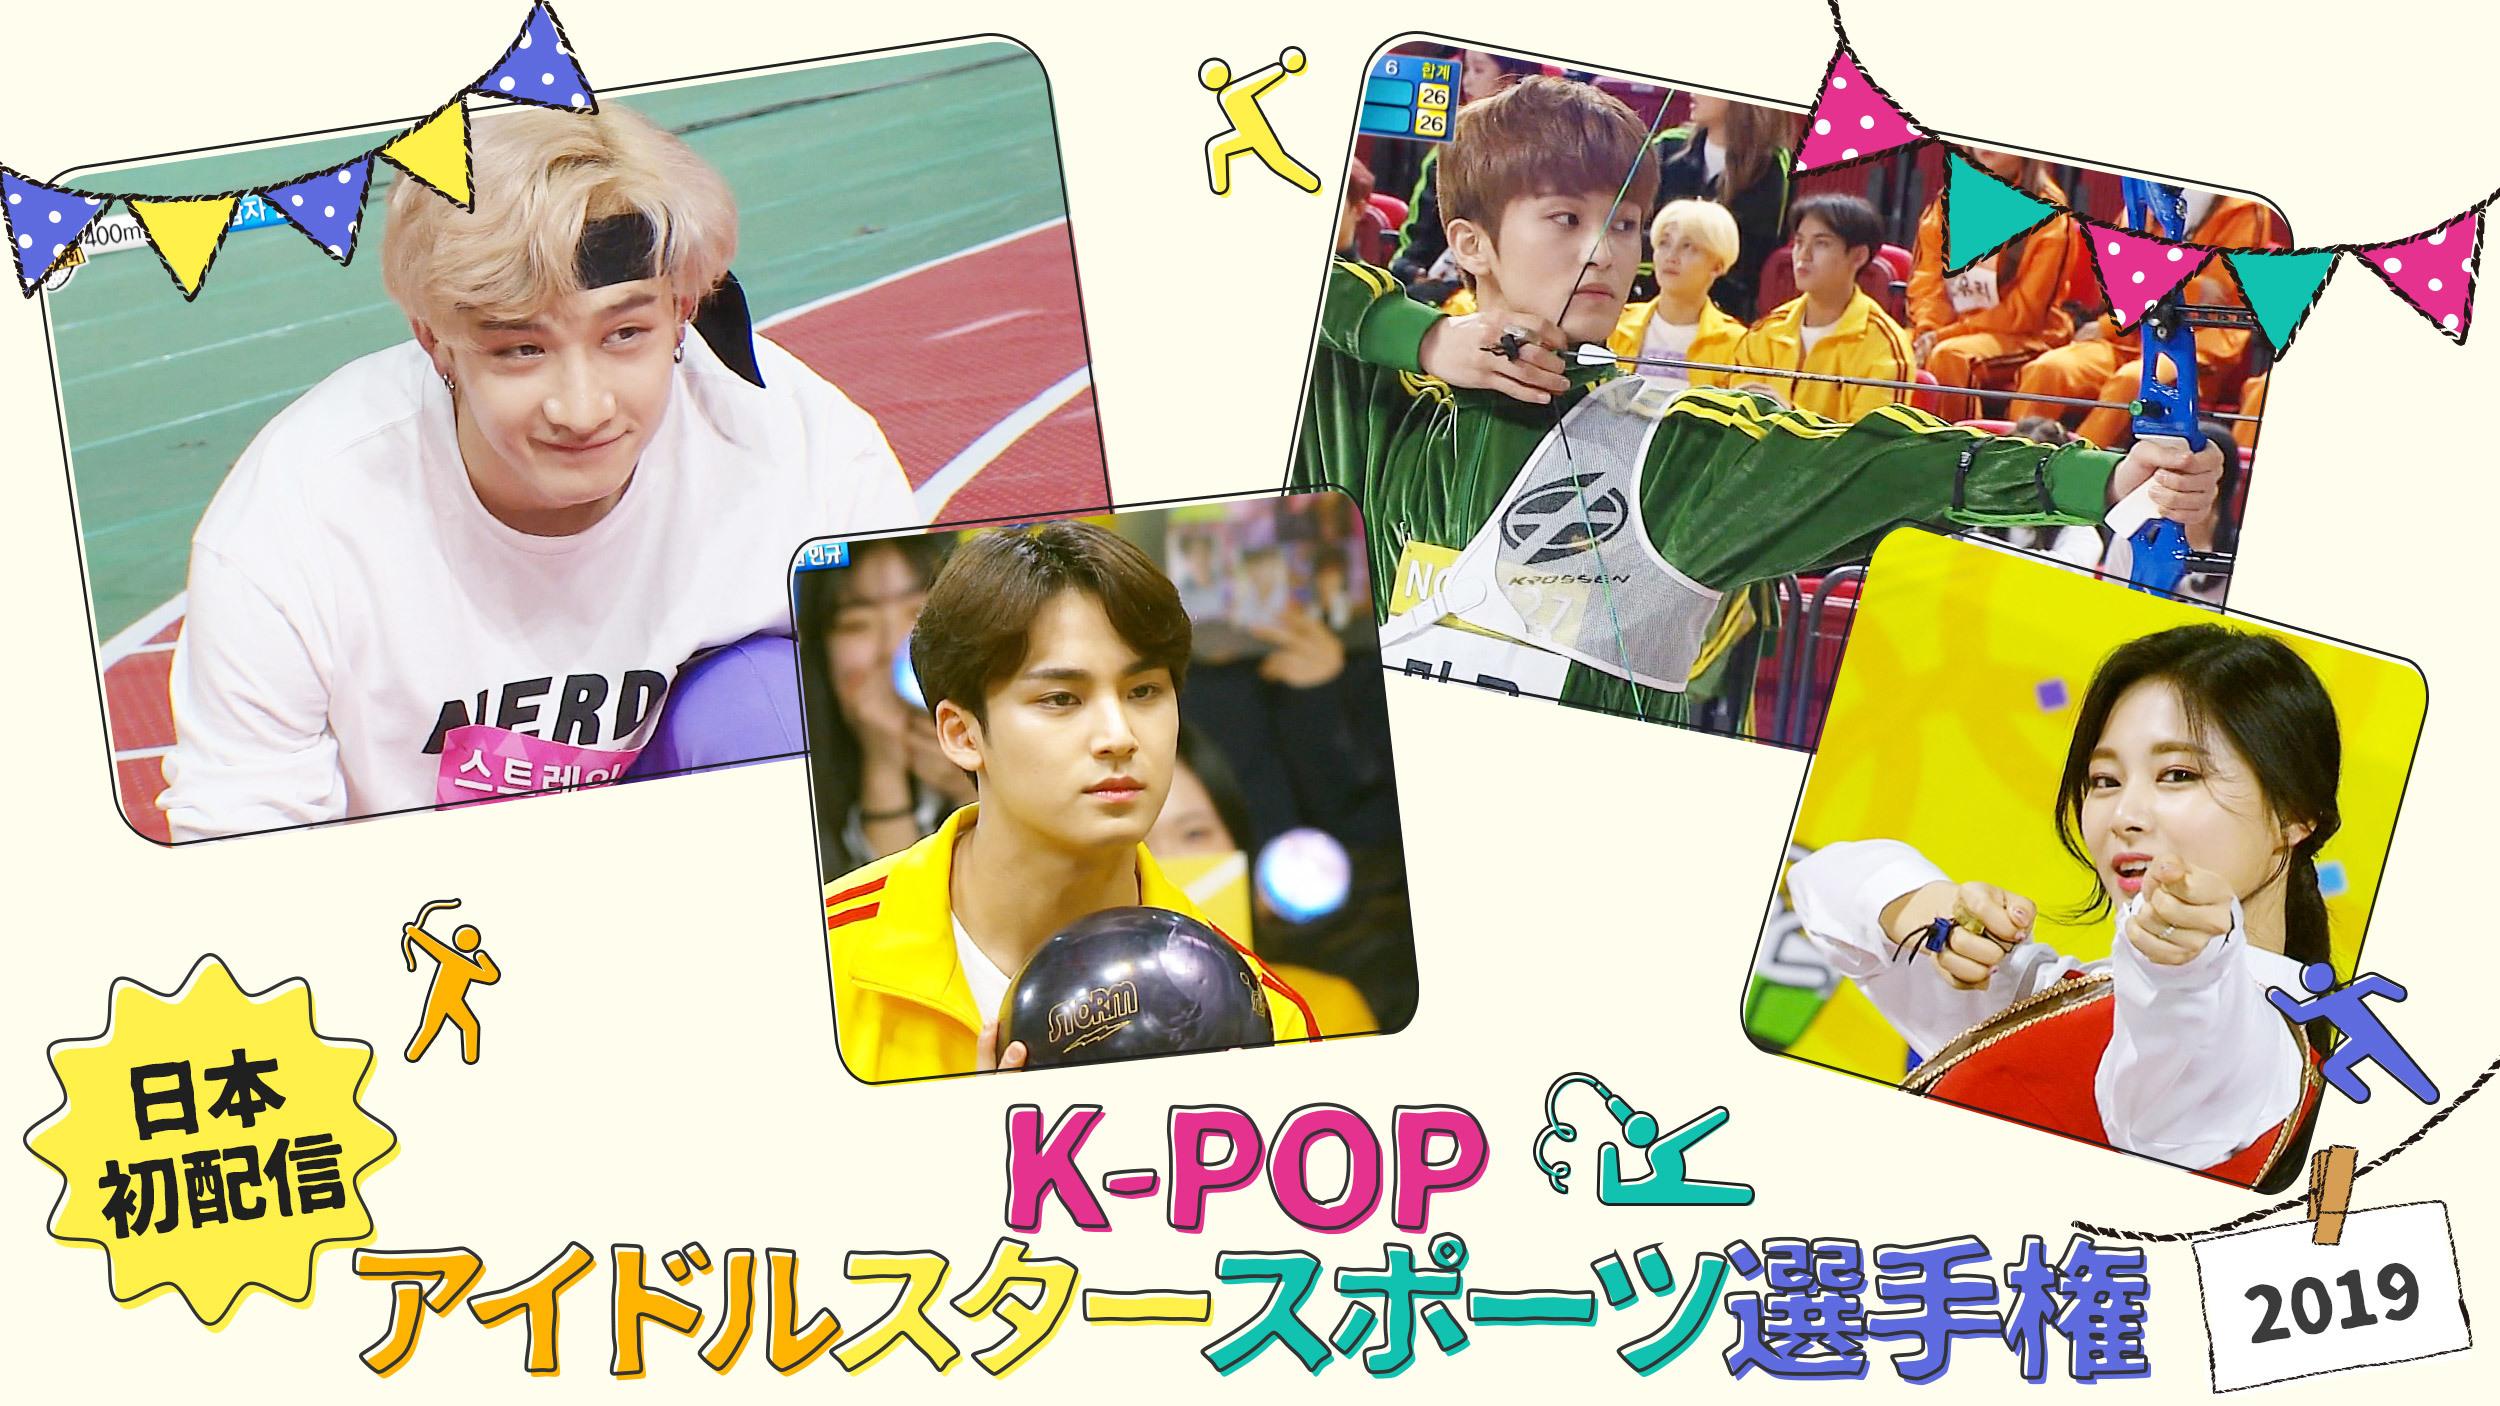 K-POPアイドルスタースポーツ選手権2019  (C)MBC